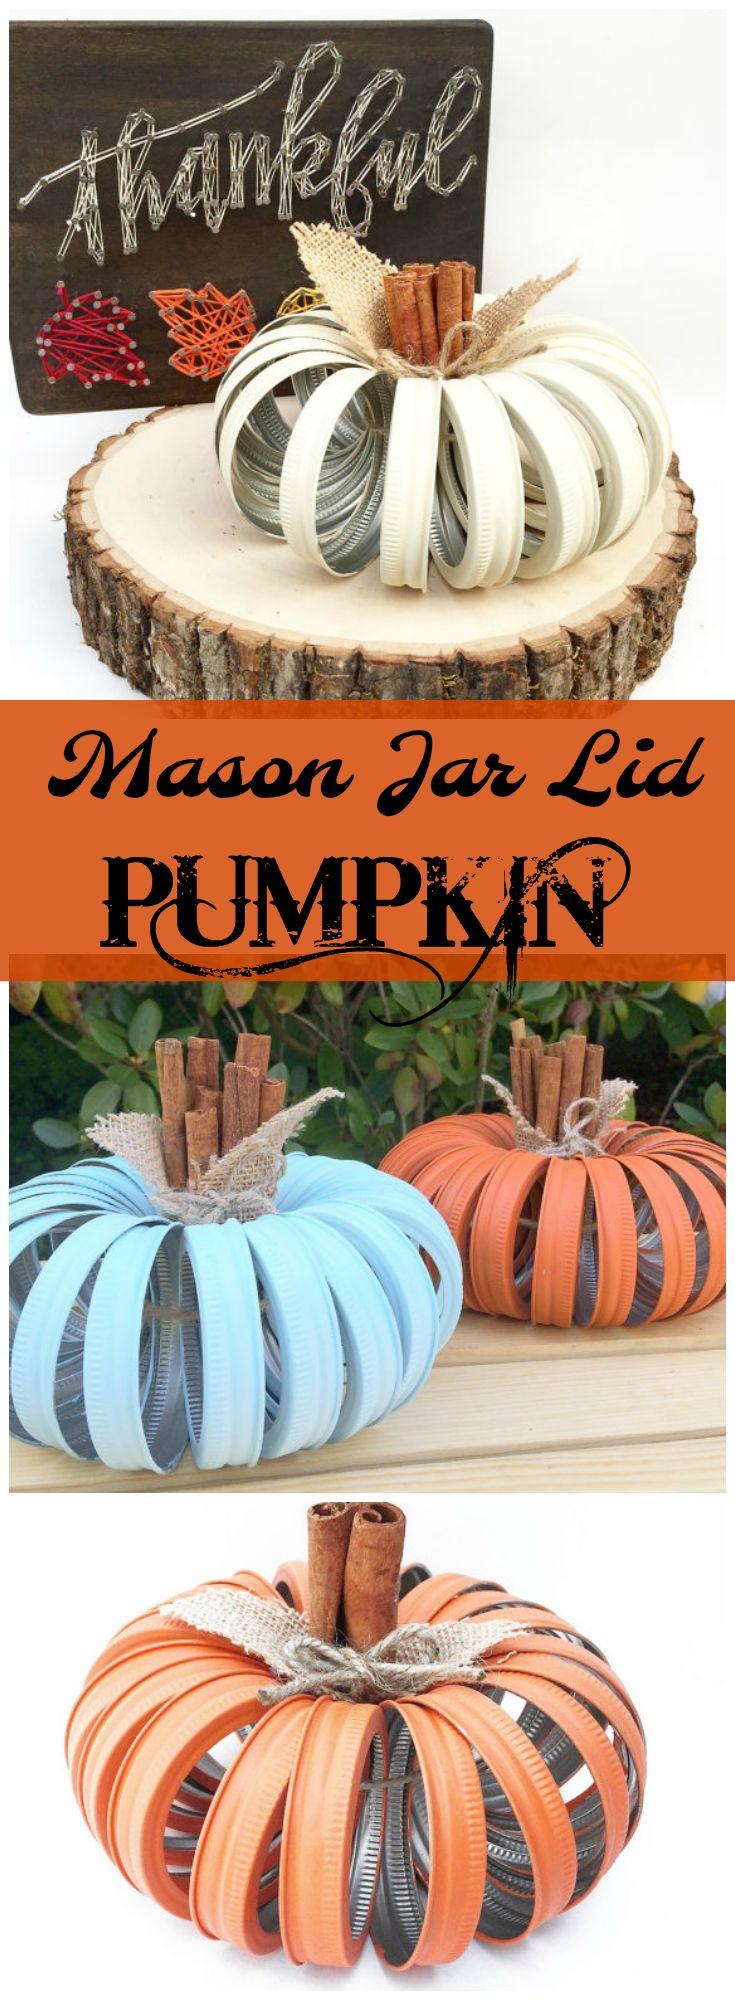 Adorable Mason Jar Lid Pumpkin. I love everything about these--Rustic, Hand painted, Cinnamon Stick Stems, Burlap Leaves, Jute Twine Bow. Autumn Decor Heaven! #Fall #Rustic #MasonJar